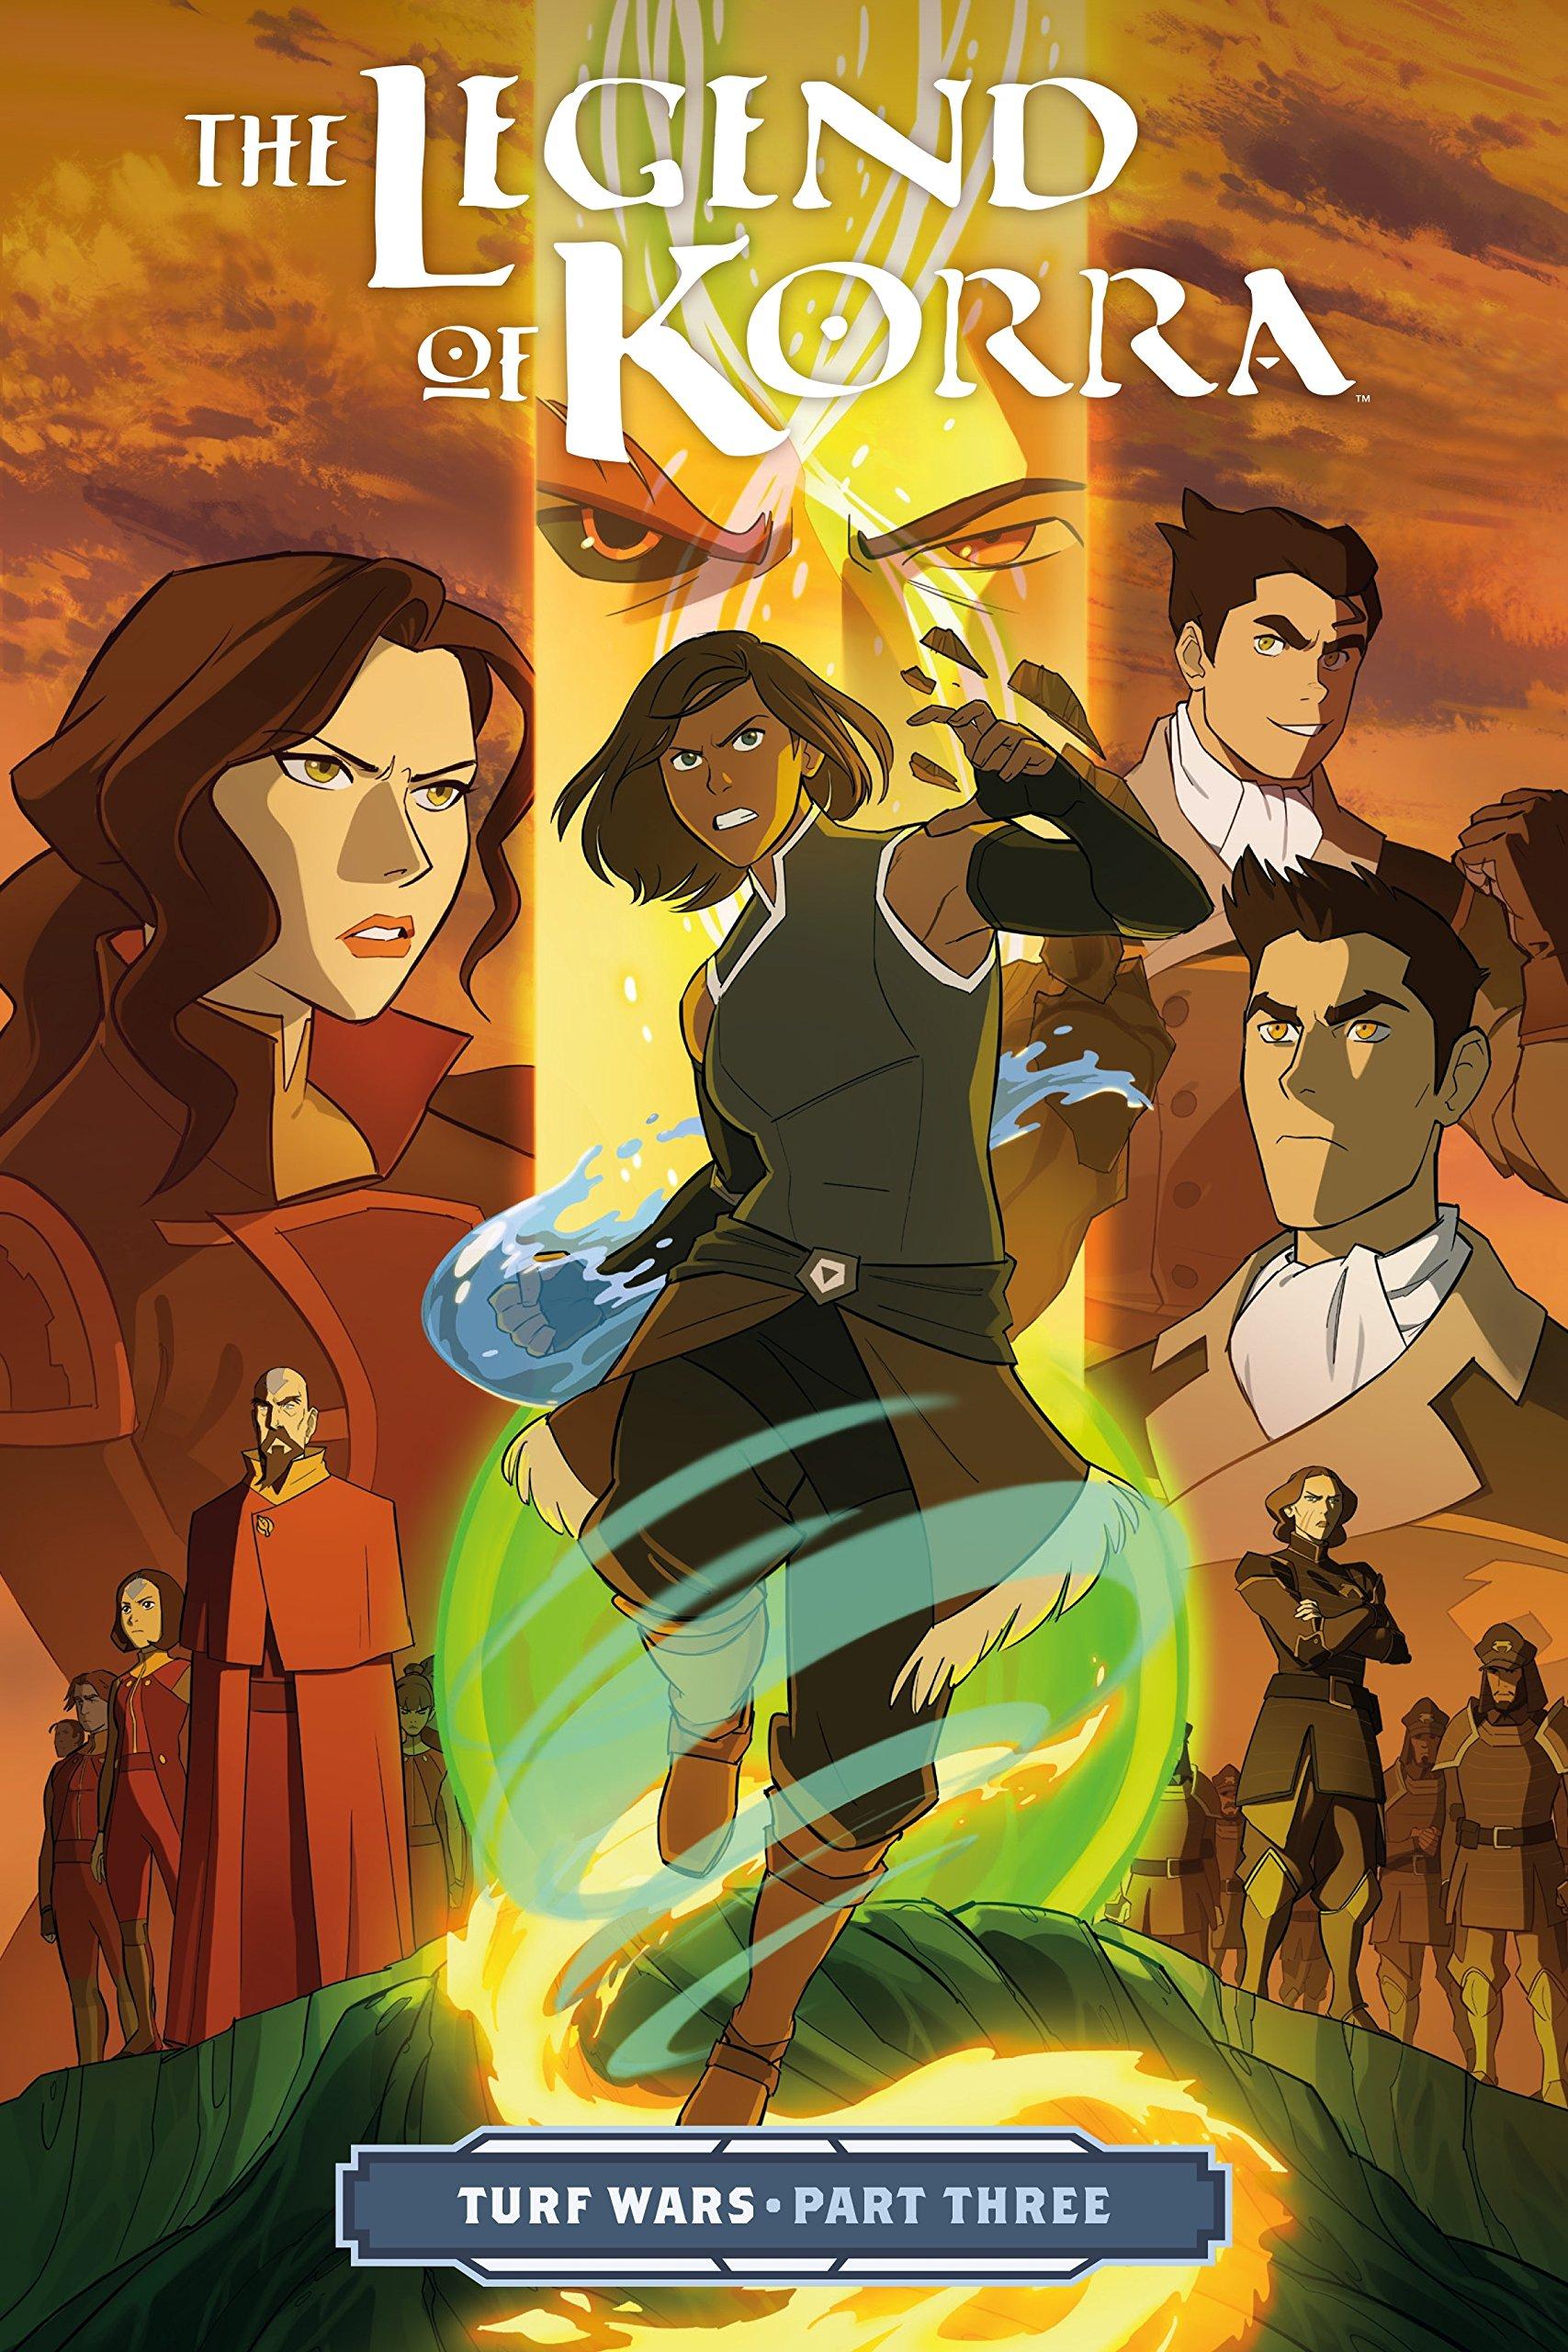 The Legend of Korra: Turf Wars Part Three: DiMartino, Michael Dante, Koh,  Irene, Ng, Killian: 9781506701851: Amazon.com: Books